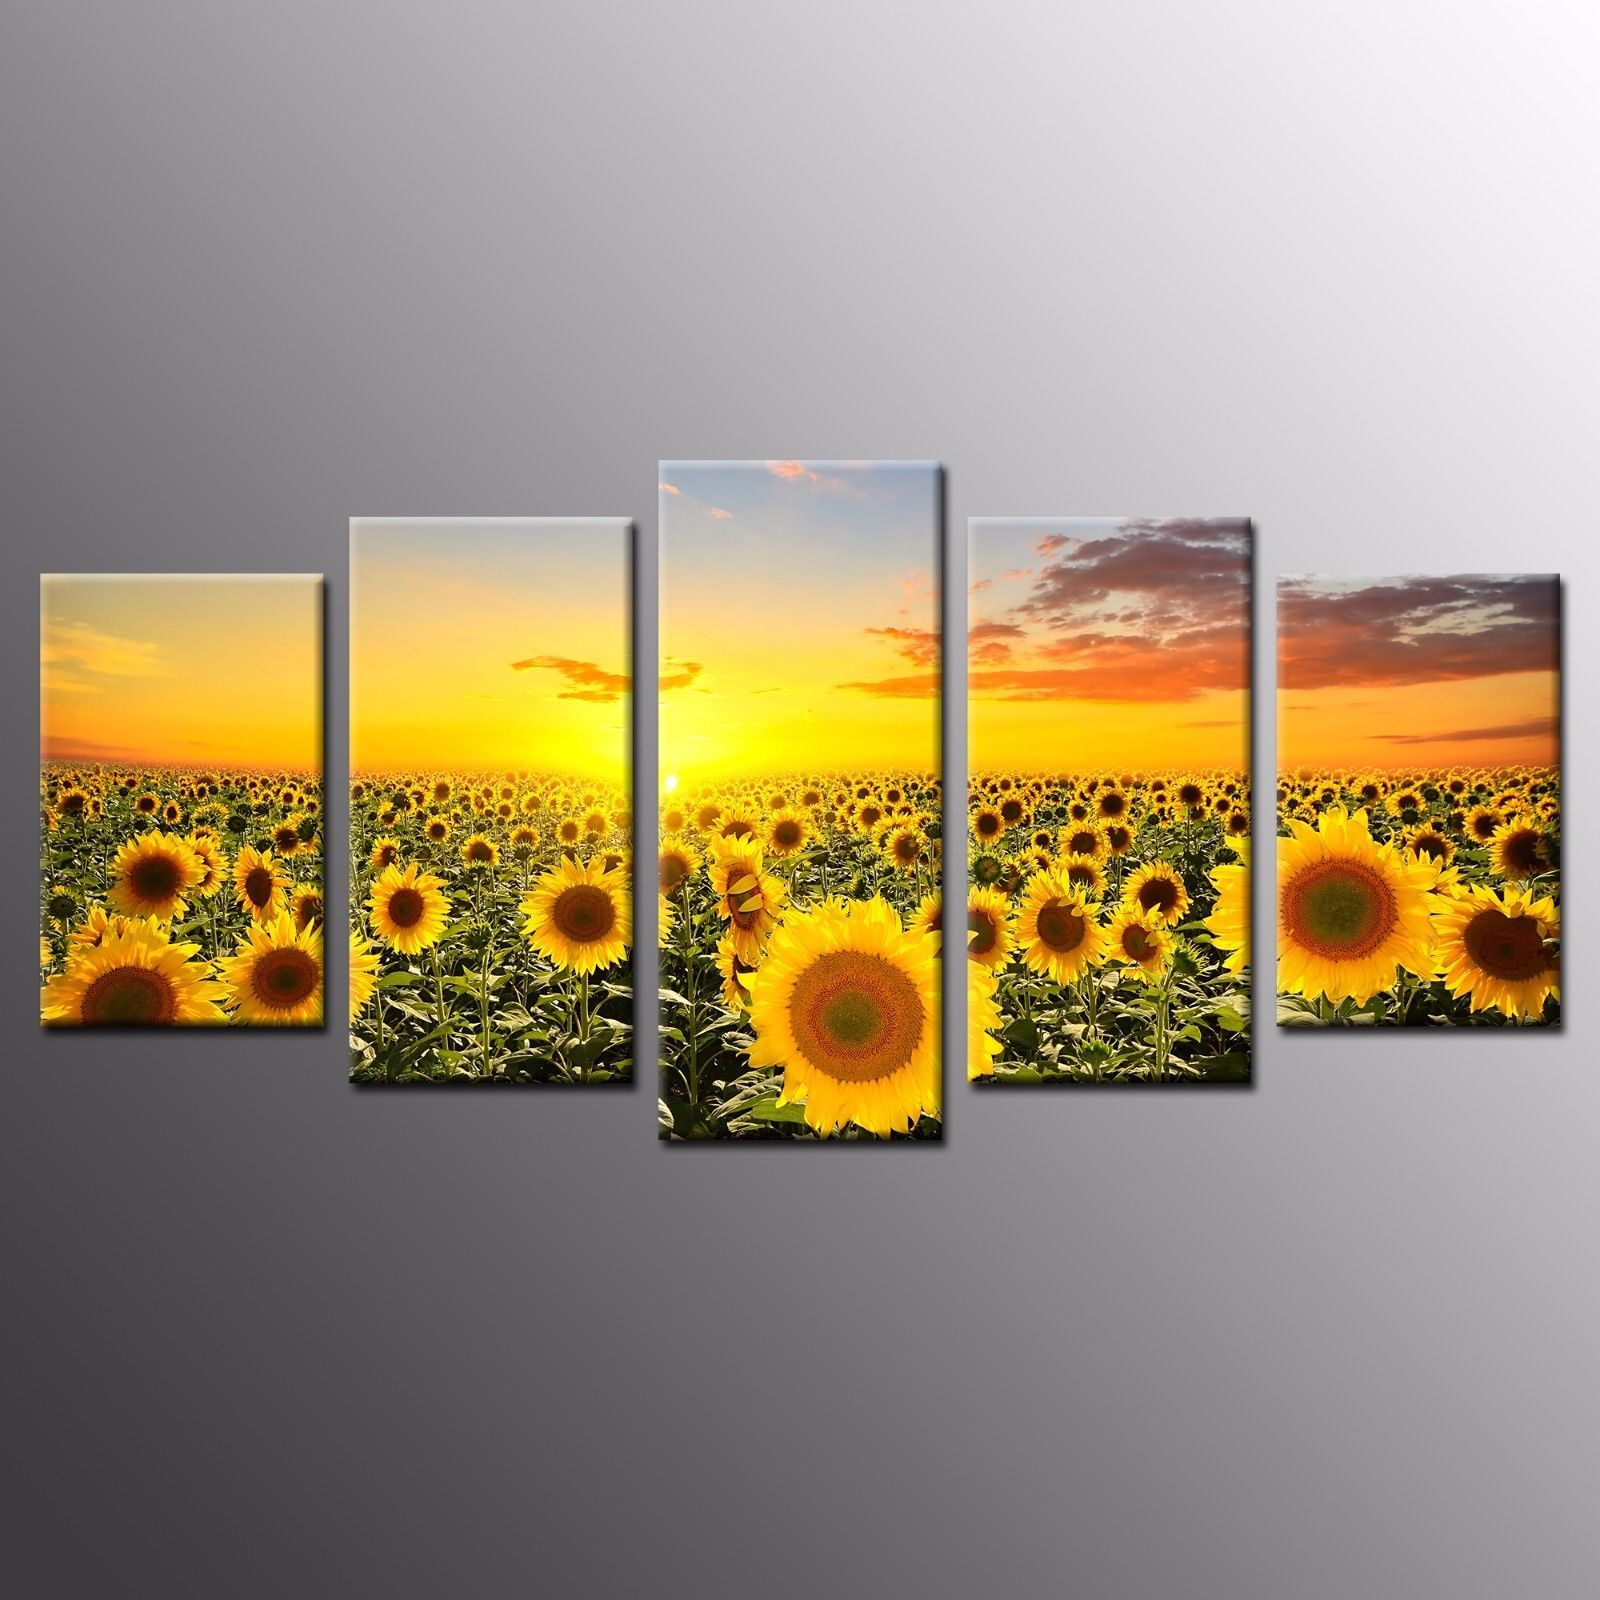 Hd Canvas Wall Art Home Decor Sunflower Canvas Prints Oil Painting ...